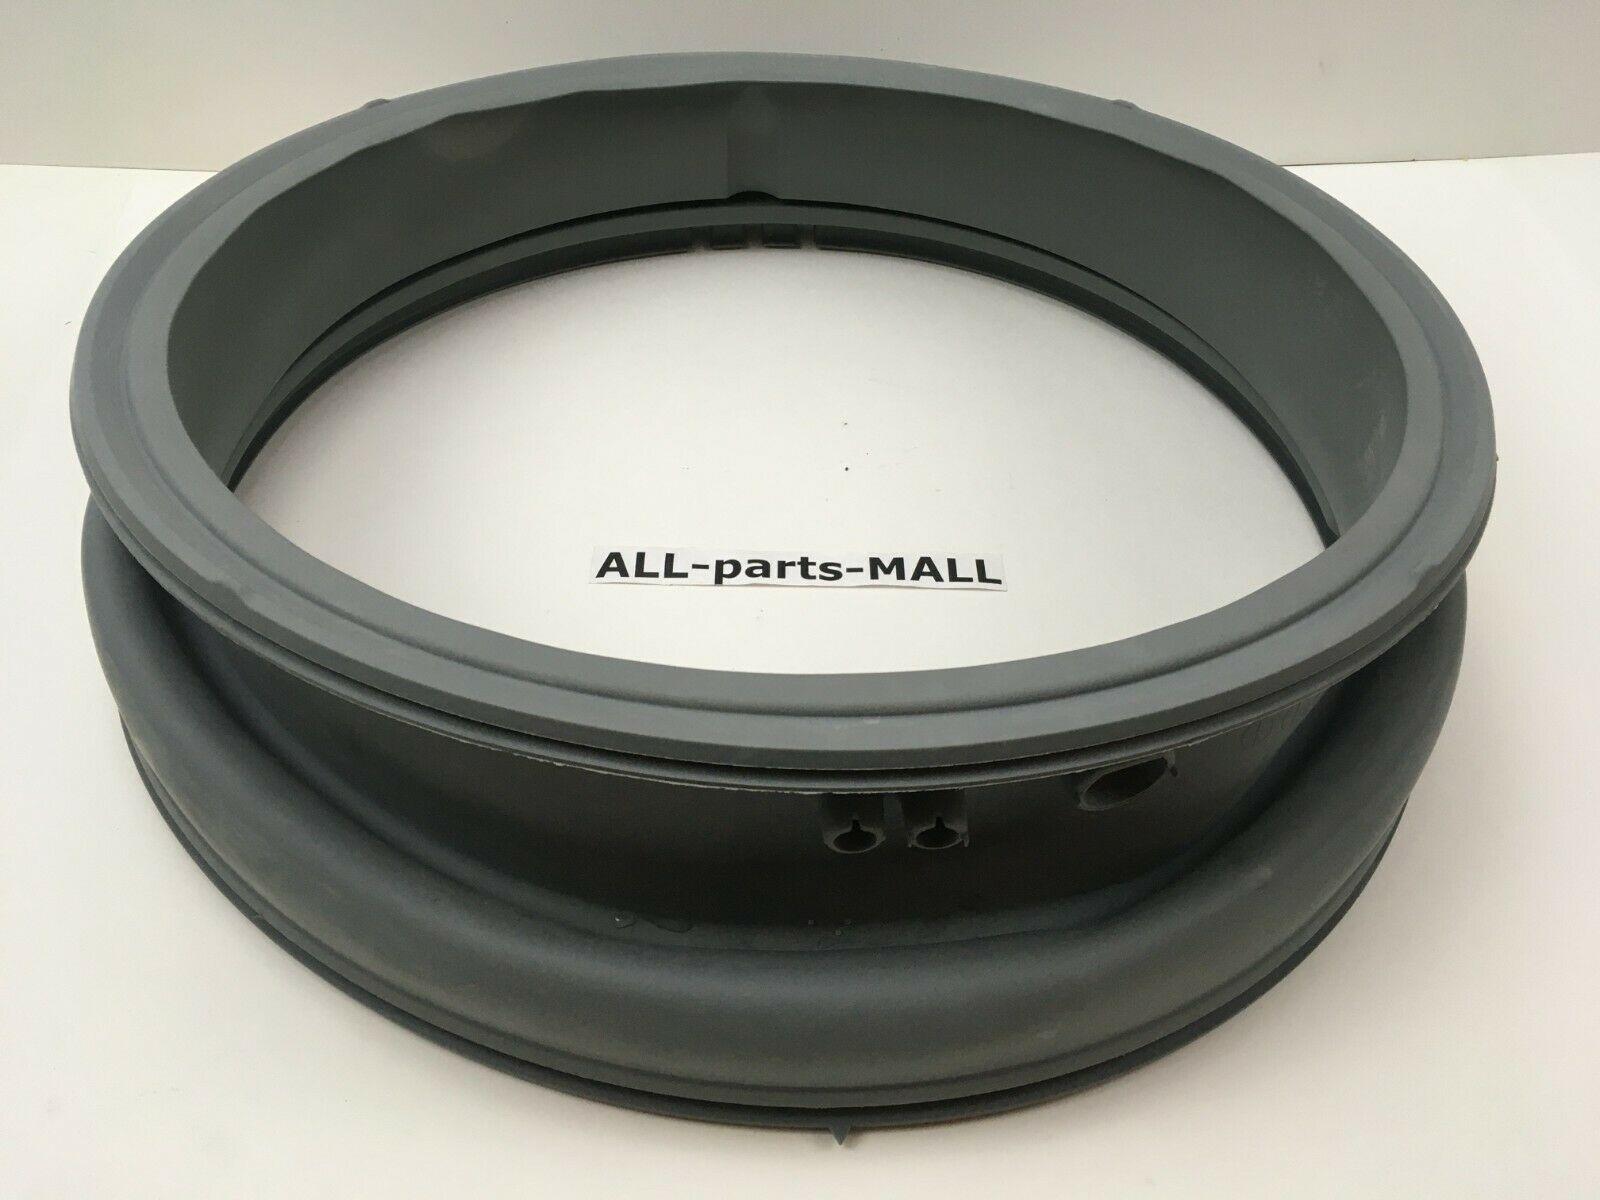 LG Kenmore Washer Door Boot Seal 4986ER0004F 4986ER0004 NO 7